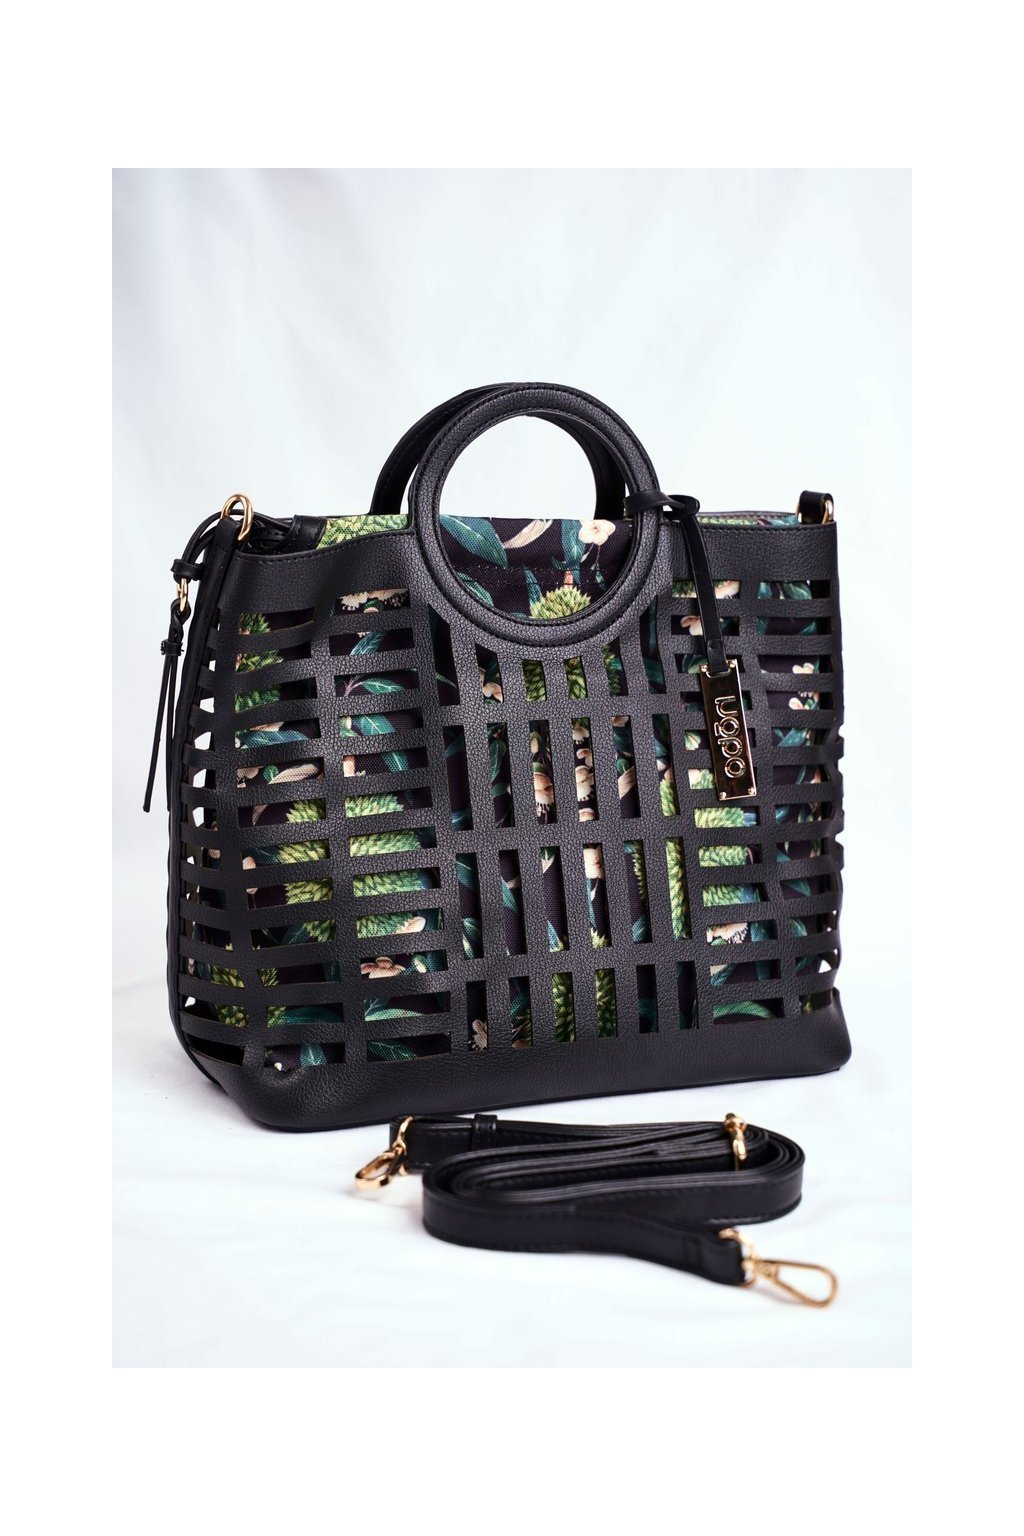 Dámska kabelka čierna kód kabelky NBAG-I3670-C020 BLK